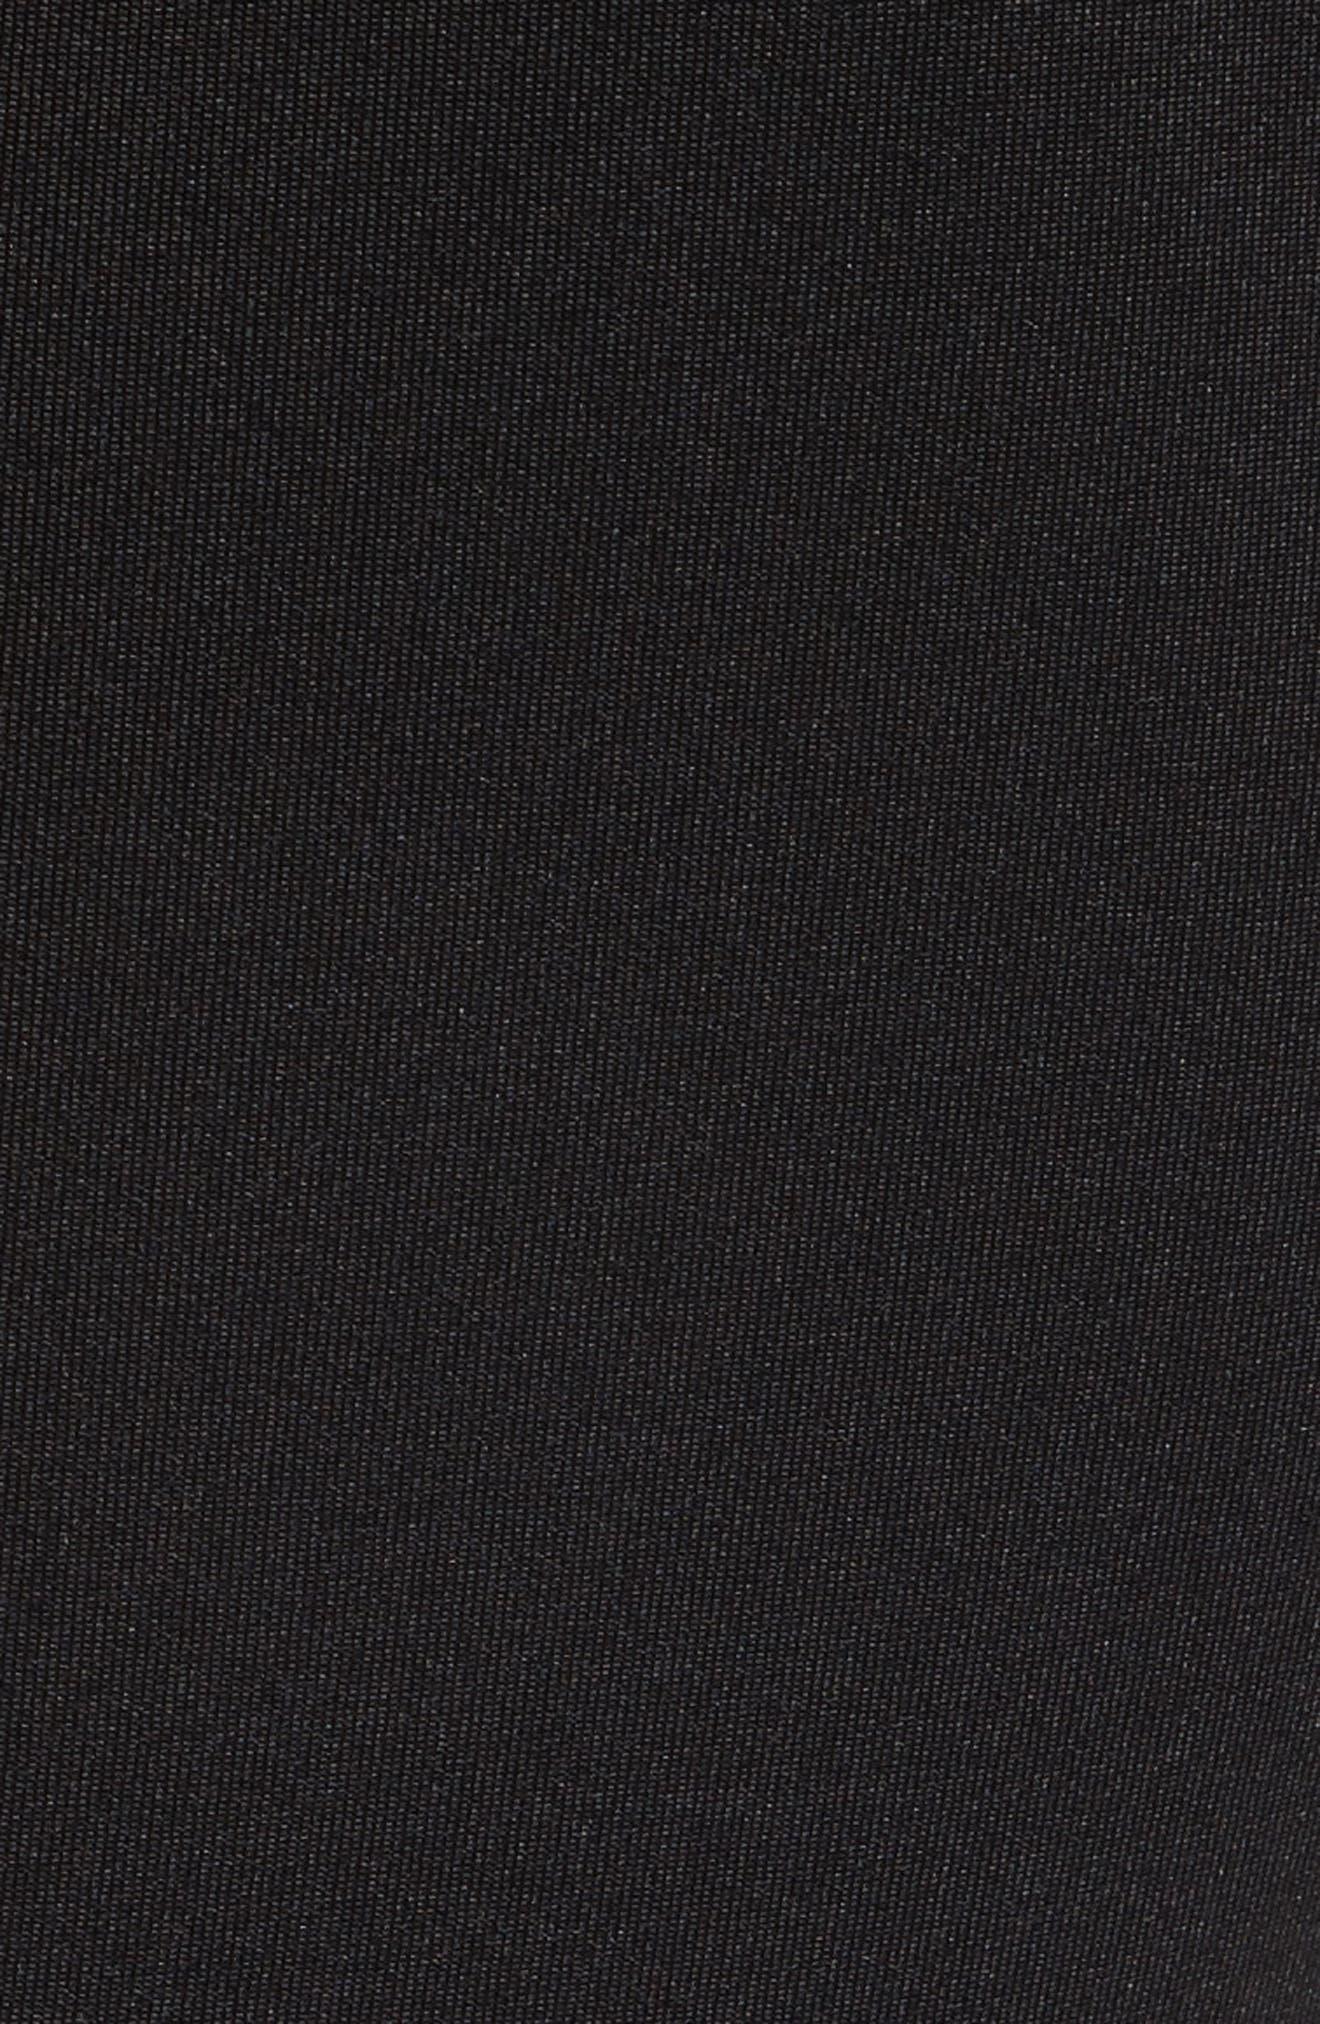 Mesh Panel Scallop Skater Dress,                             Alternate thumbnail 5, color,                             001